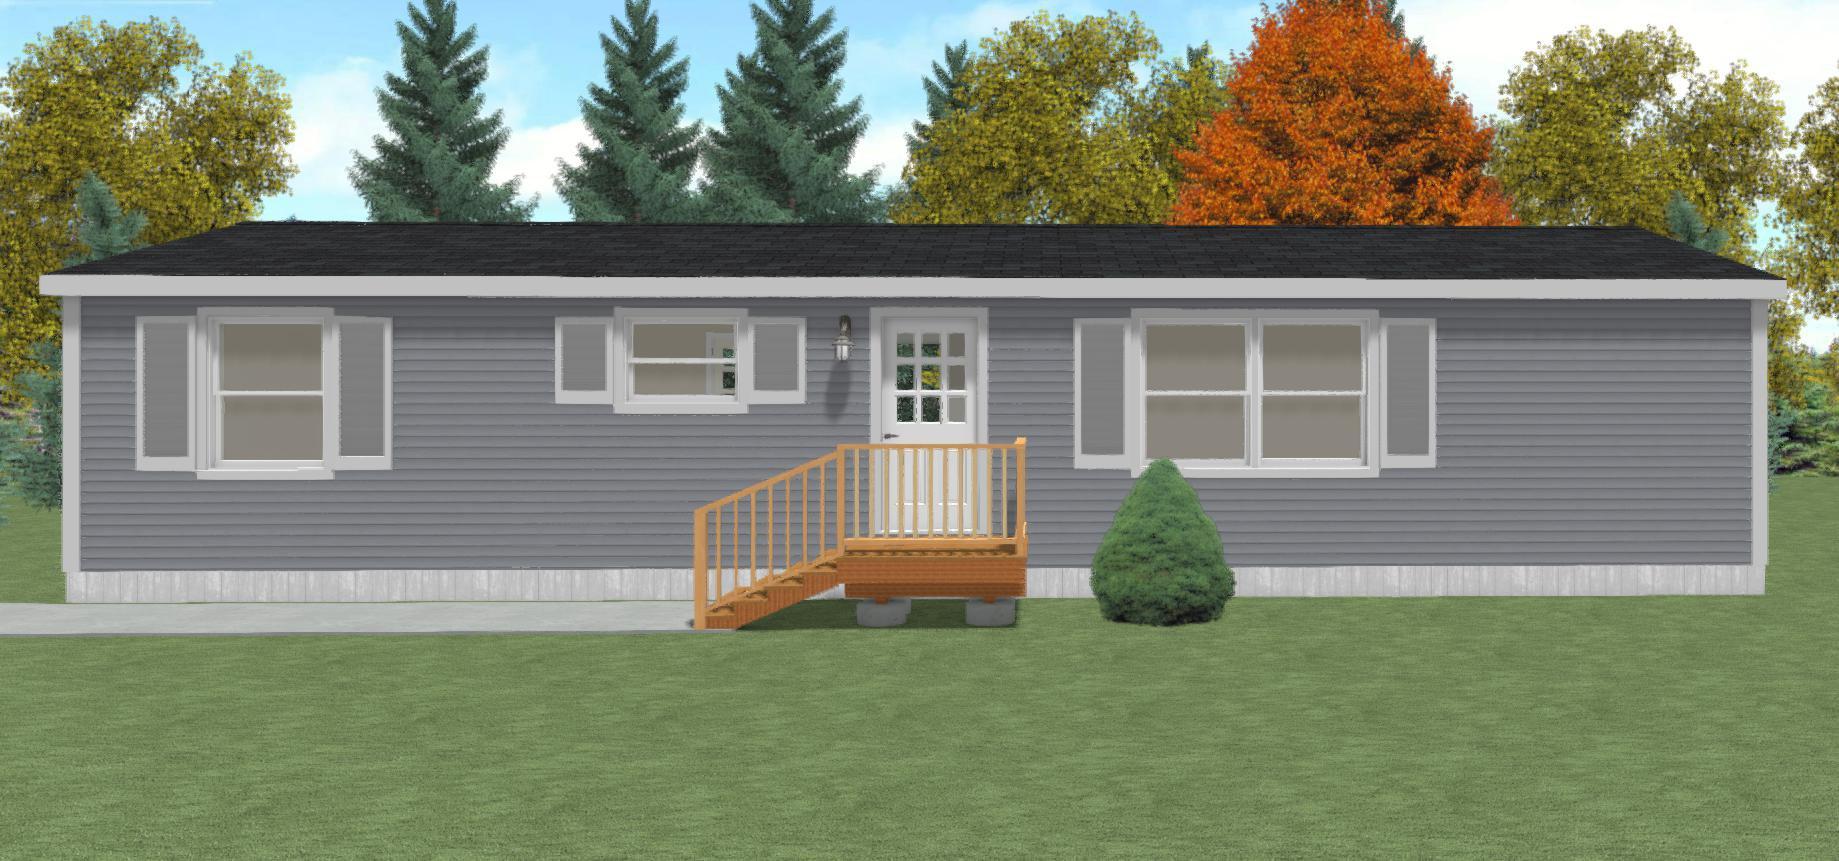 Main Photo: 1508 Mini Home